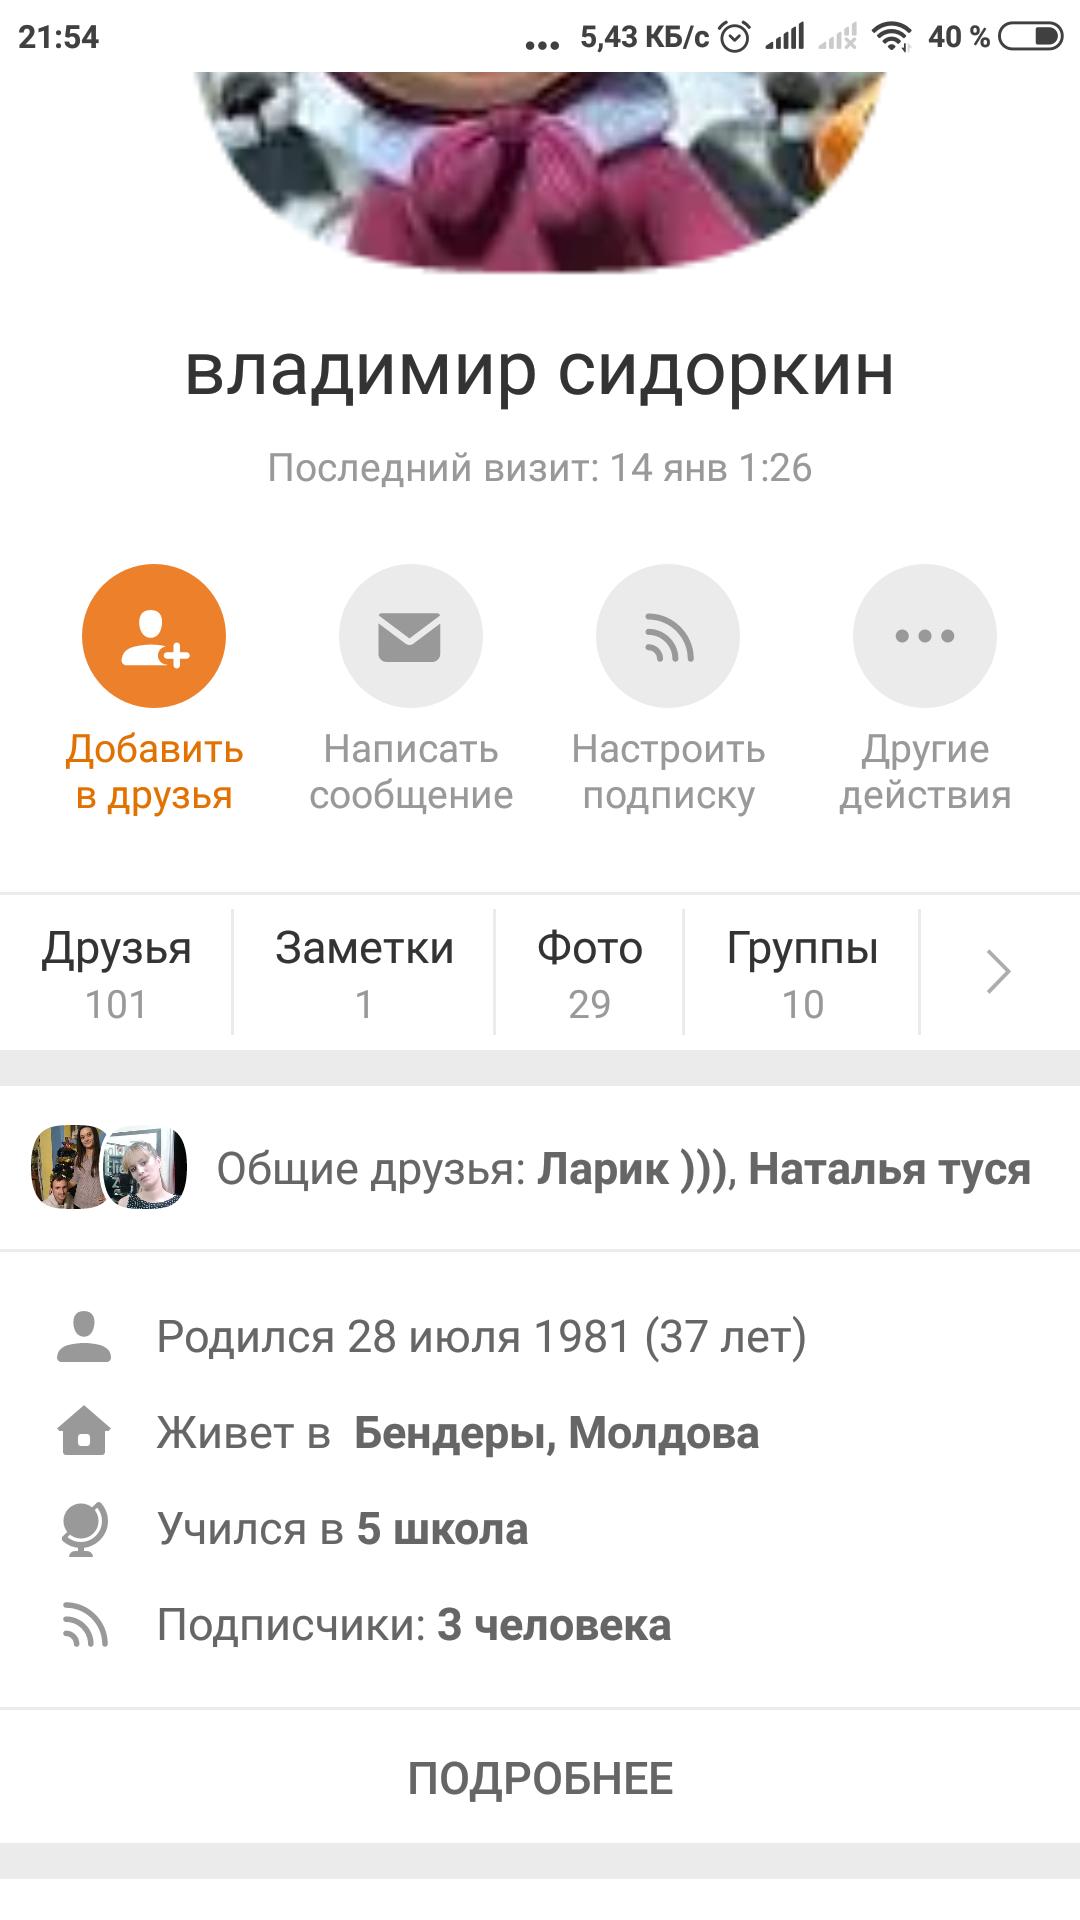 Screenshot_2019-01-30-21-54-46-979_ru.ok.android.png